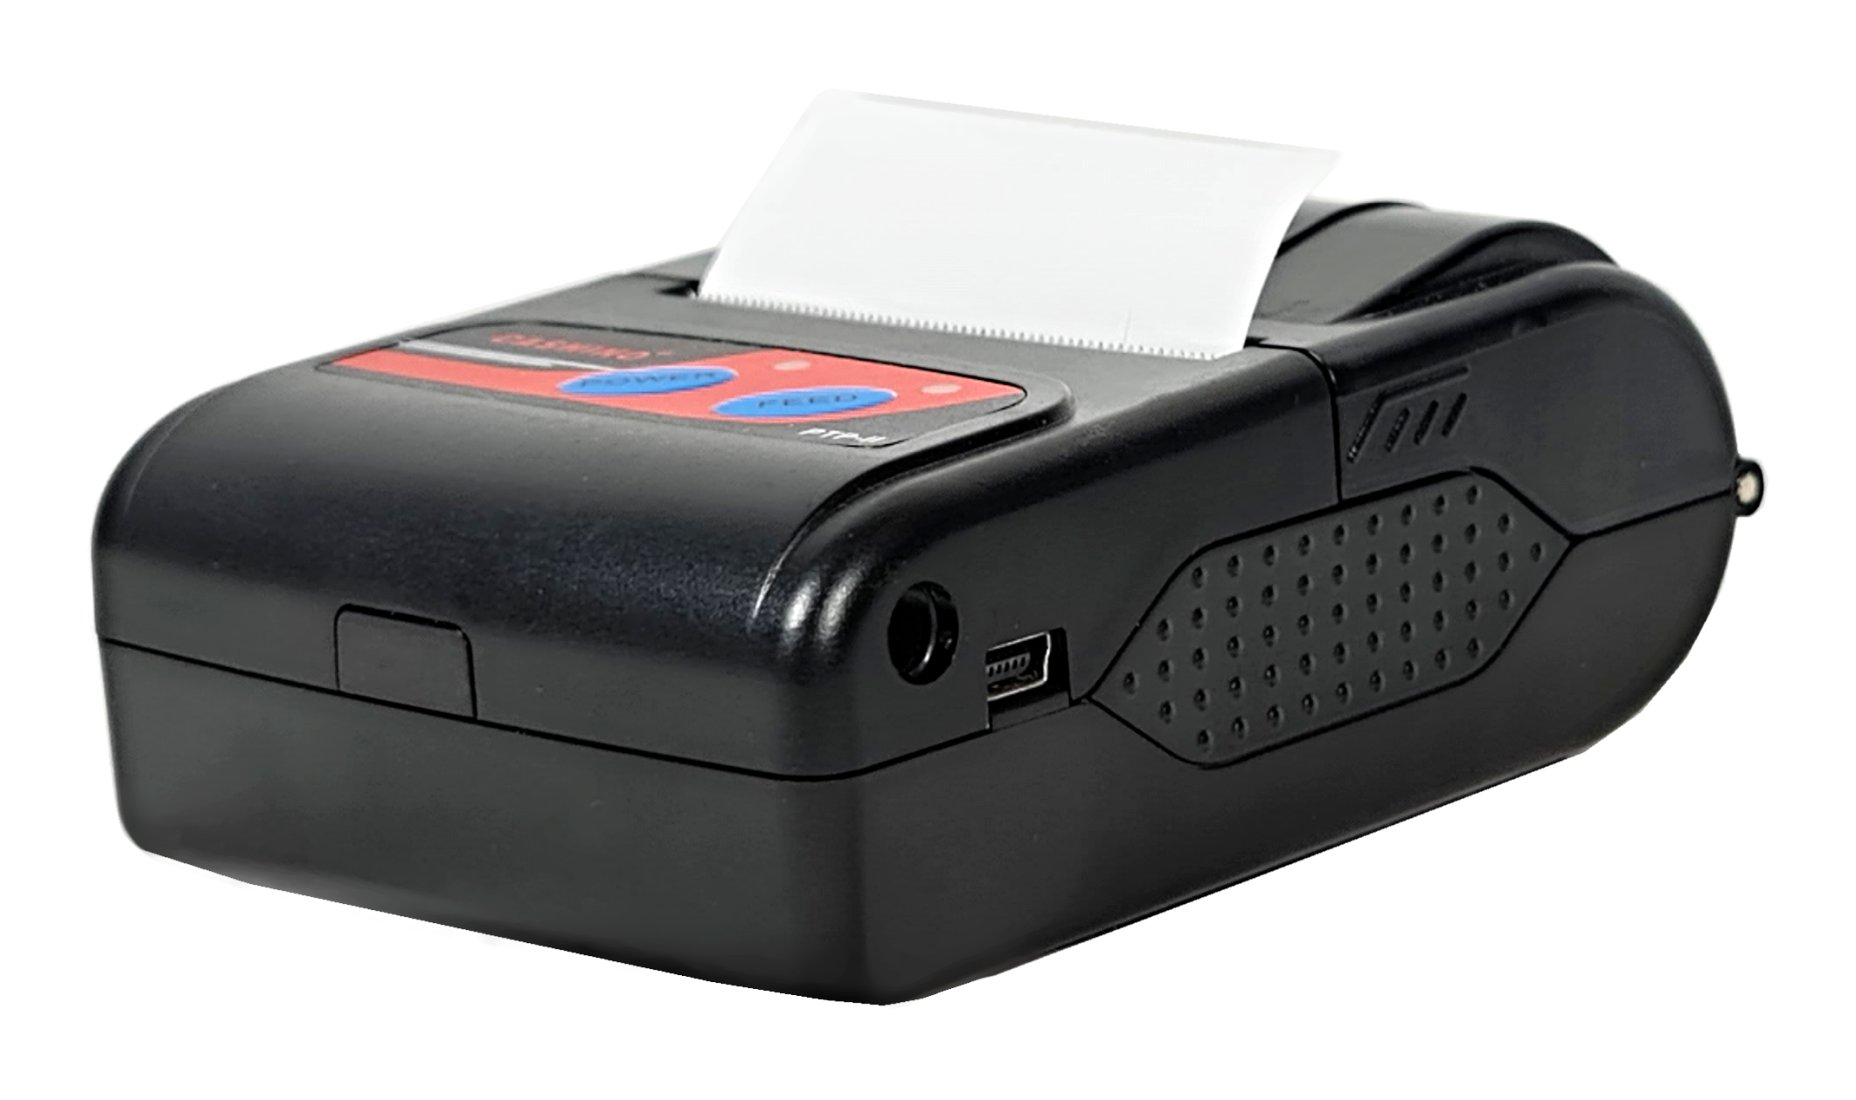 Mobilní tiskárna Cashino PTP - II DUAL BT Android, iOS a Windows repasovaná